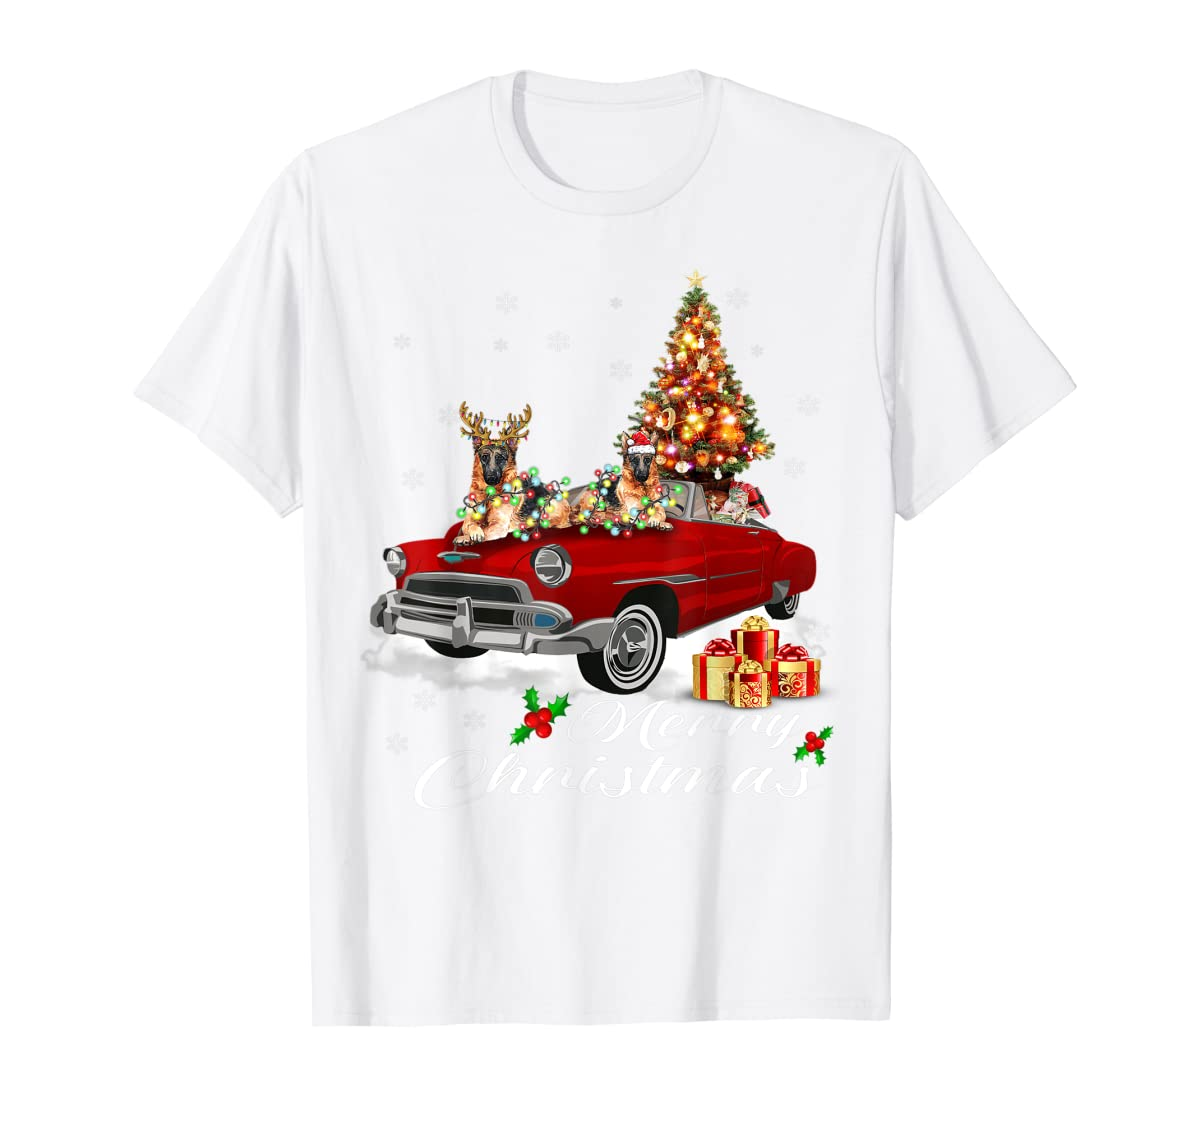 German Shepherd on Red Truck Christmas Pajama Dog Lover Gift T-Shirt-Men's T-Shirt-White